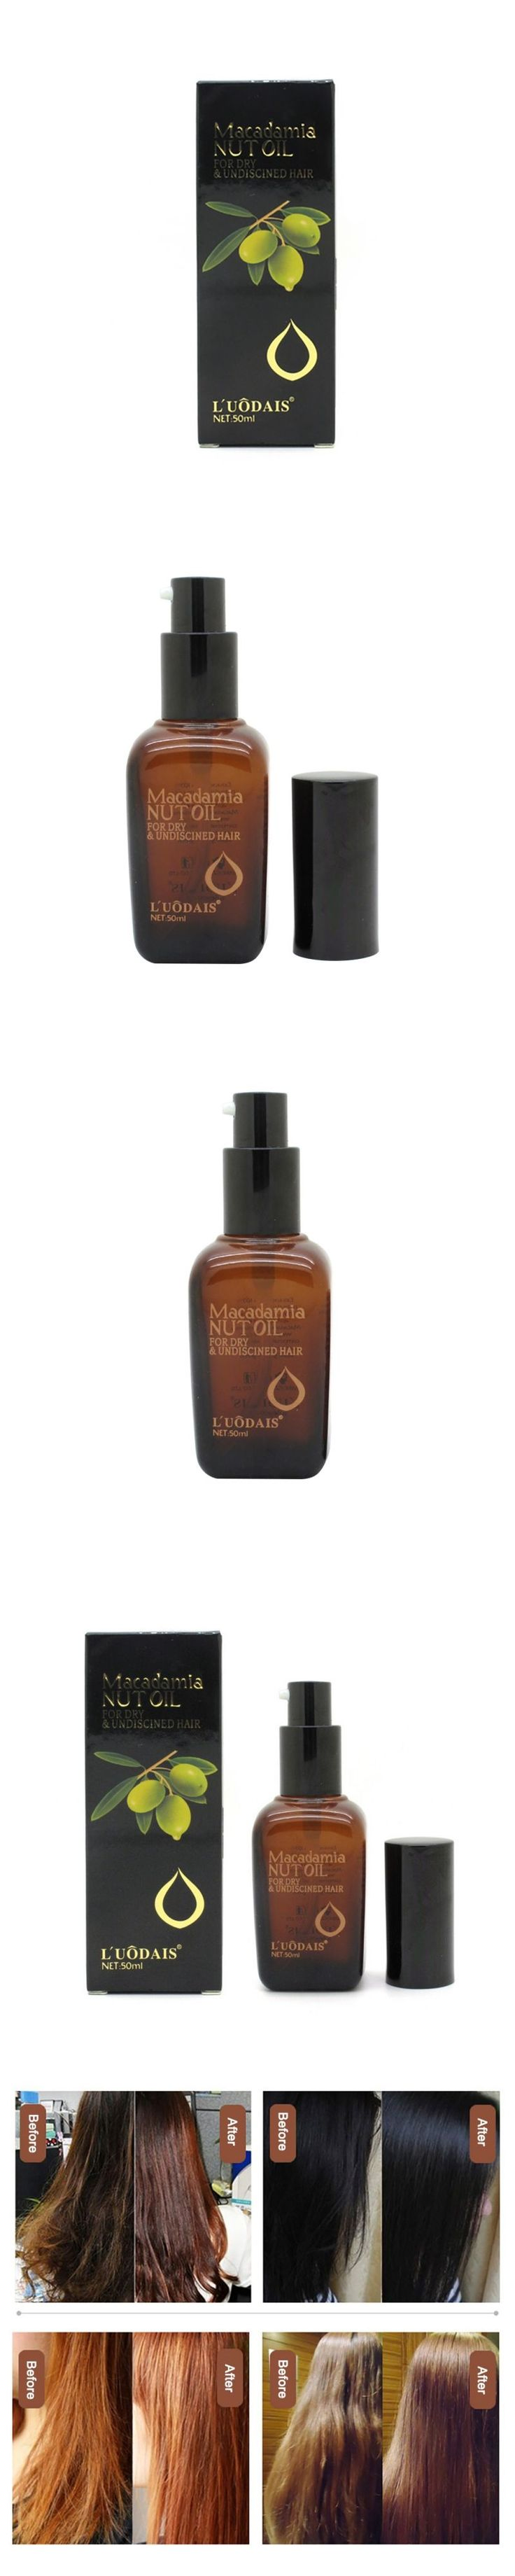 Hair Care Hair Conditioner 100% Pure Moroccan Argan Oil Macadamia Nut Oil Scalp Treatment 50ML New